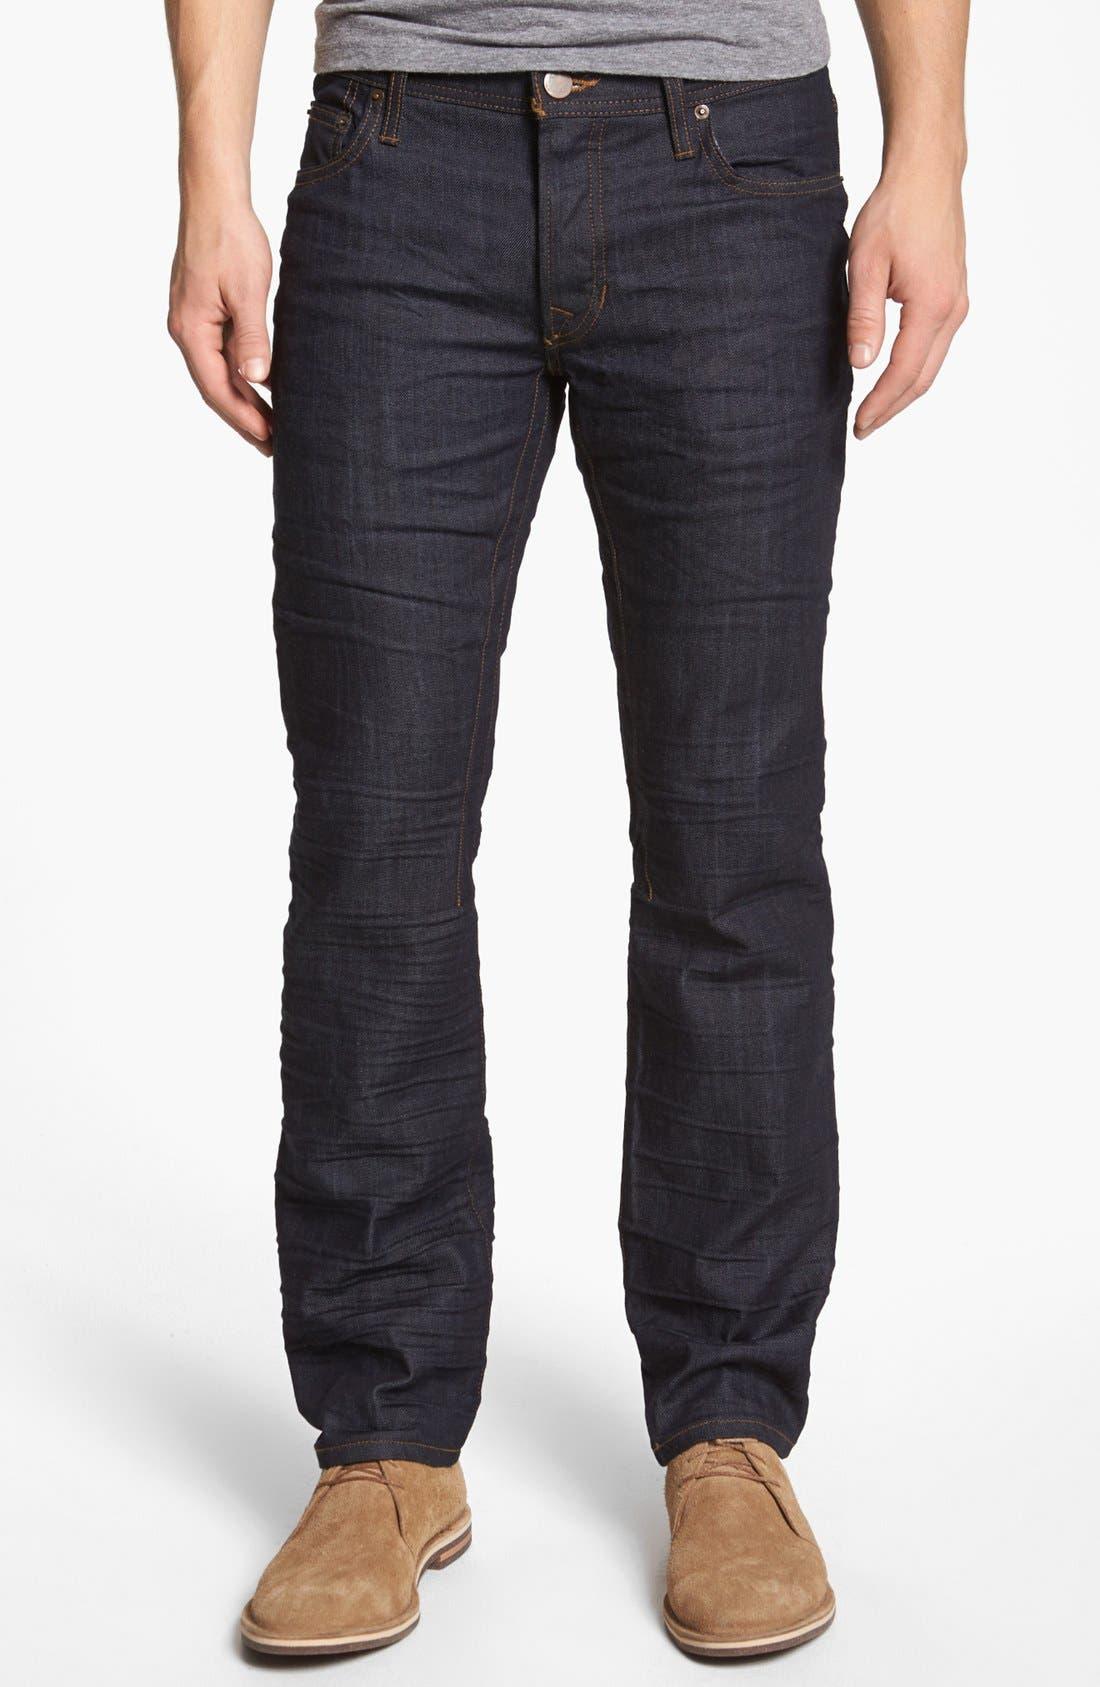 Alternate Image 1 Selected - Rogue 'Ruffian' Slim Straight Leg Jeans (Dark Blue)